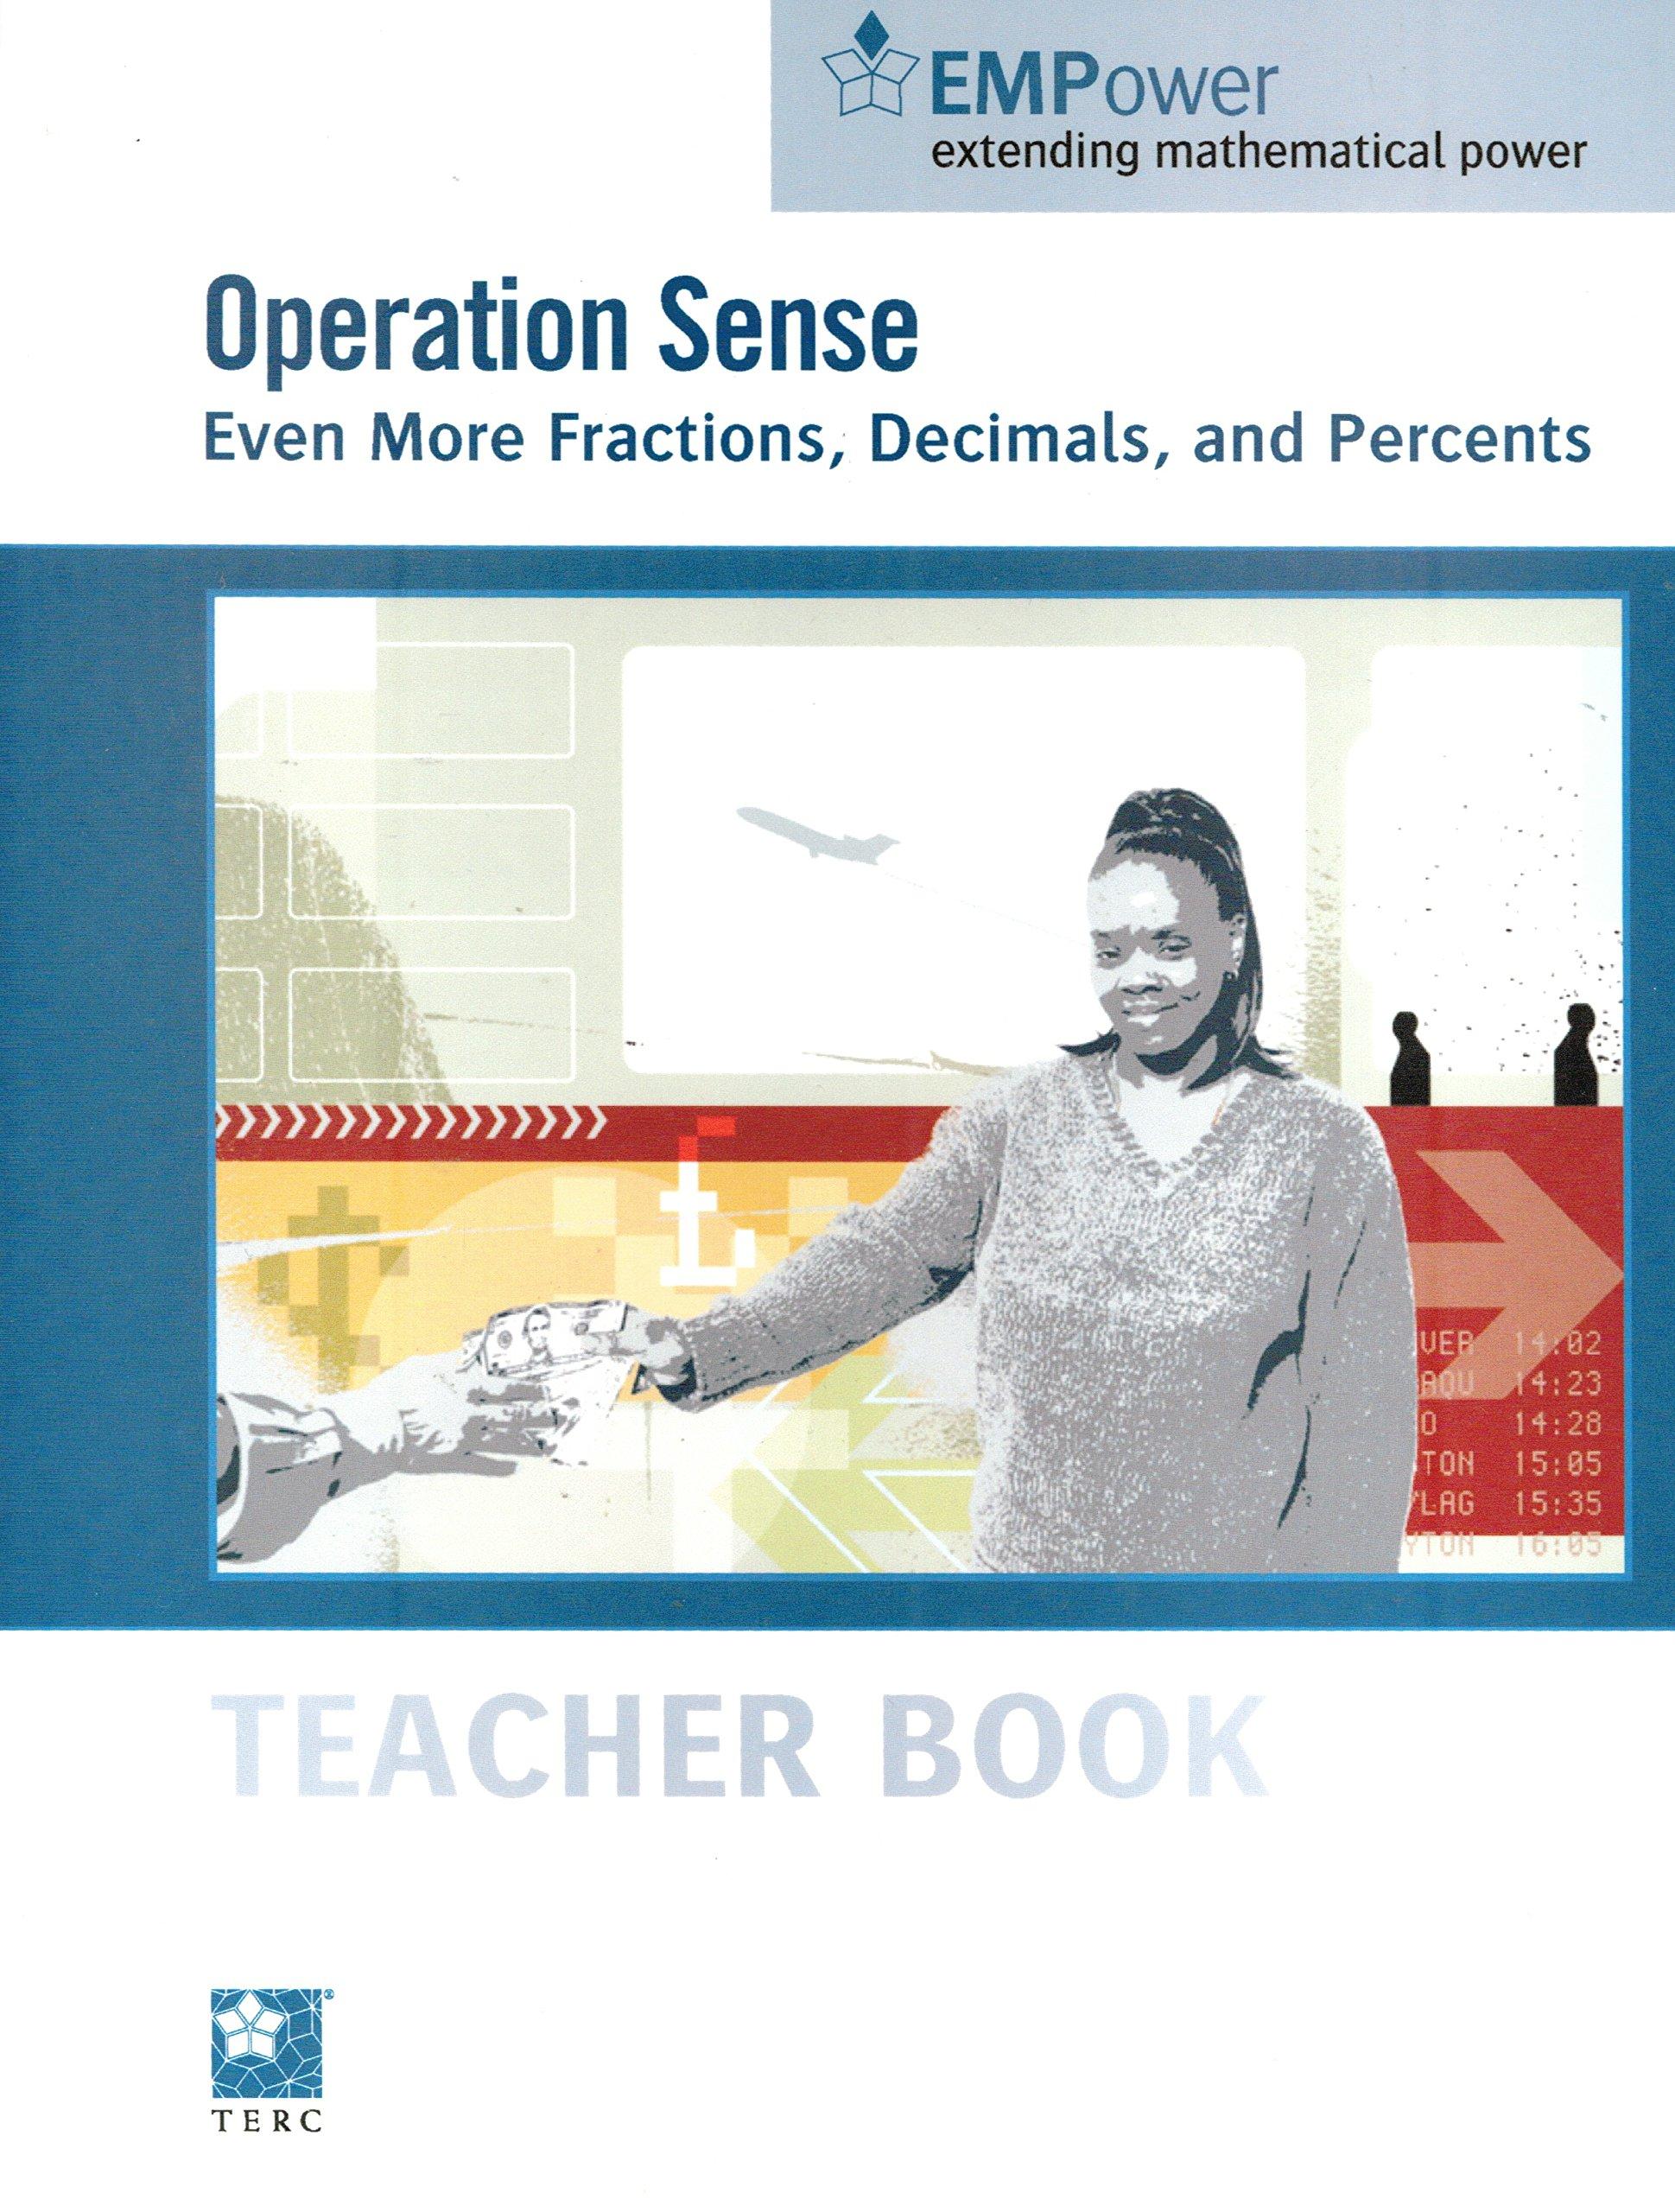 Operation Sense: Even More Fractions, Decimals, and Percents: Teacher Book (EMPower extending mathematical power) (TERC) pdf